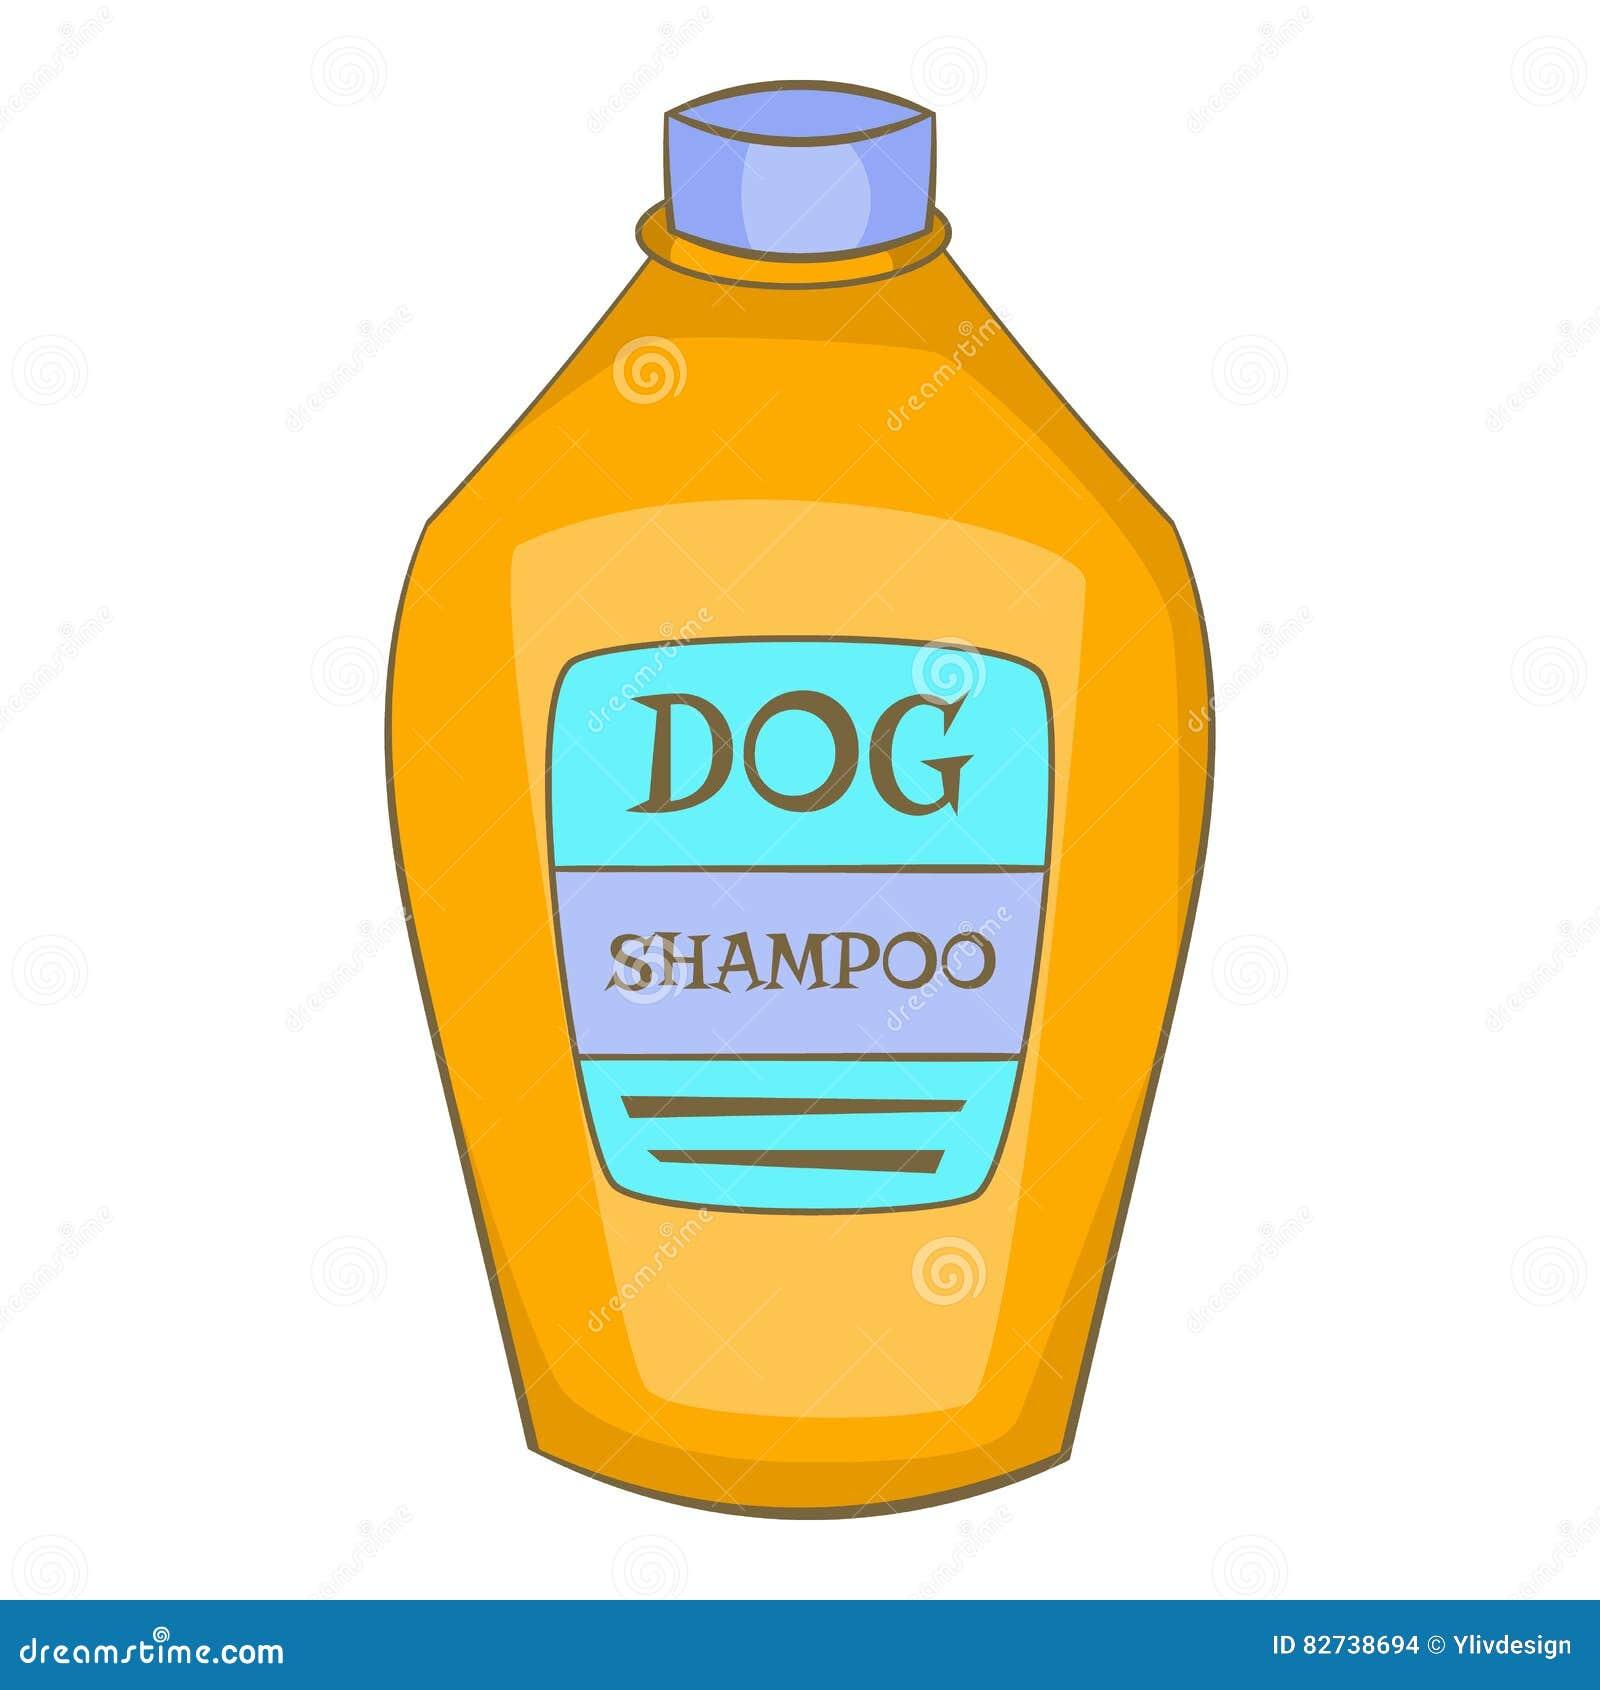 Dandruff Free Shampoo For Dogs